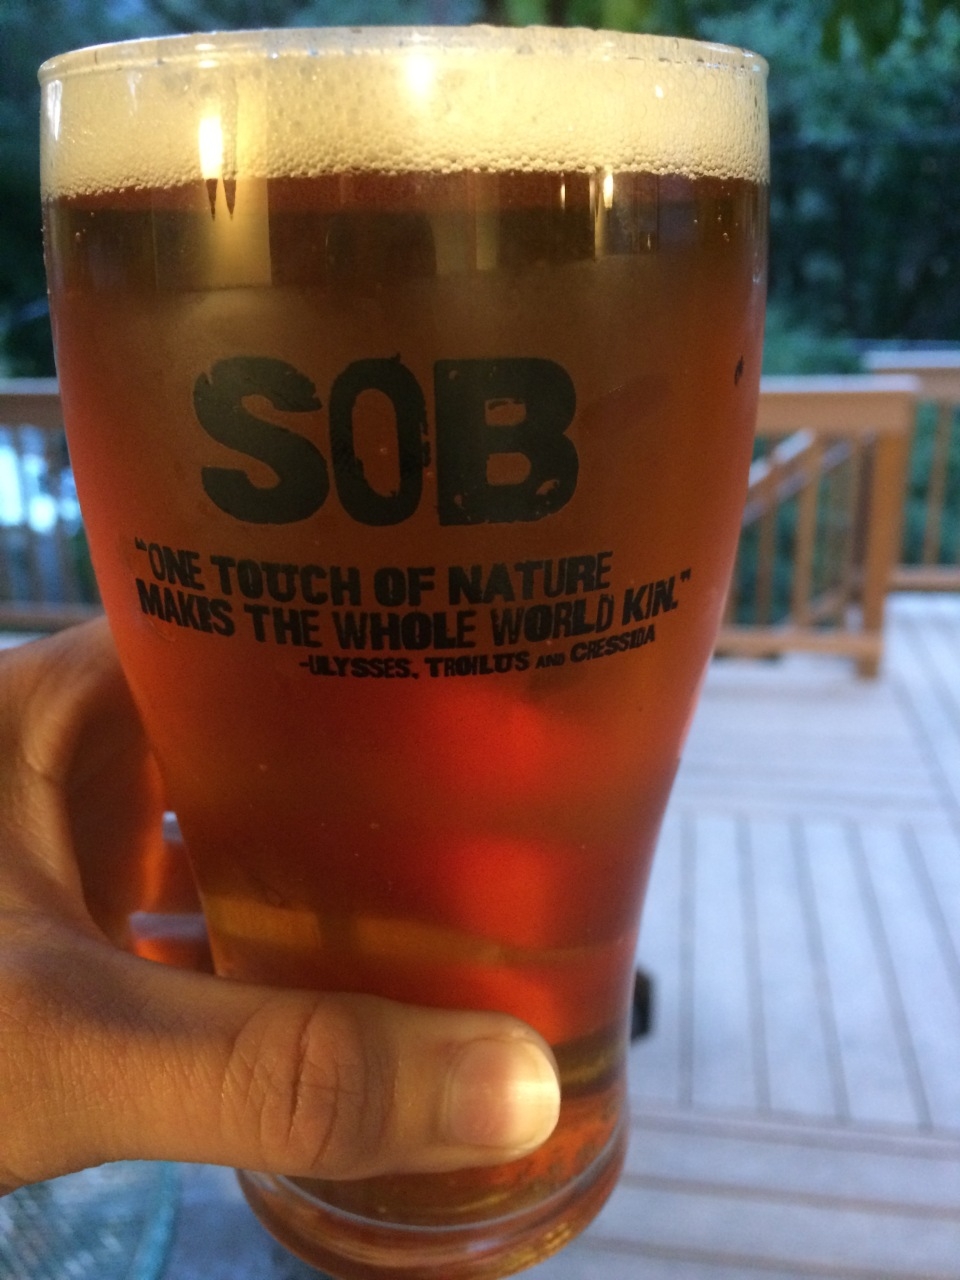 Siskiyou Outback pint glass Shakespeare beer